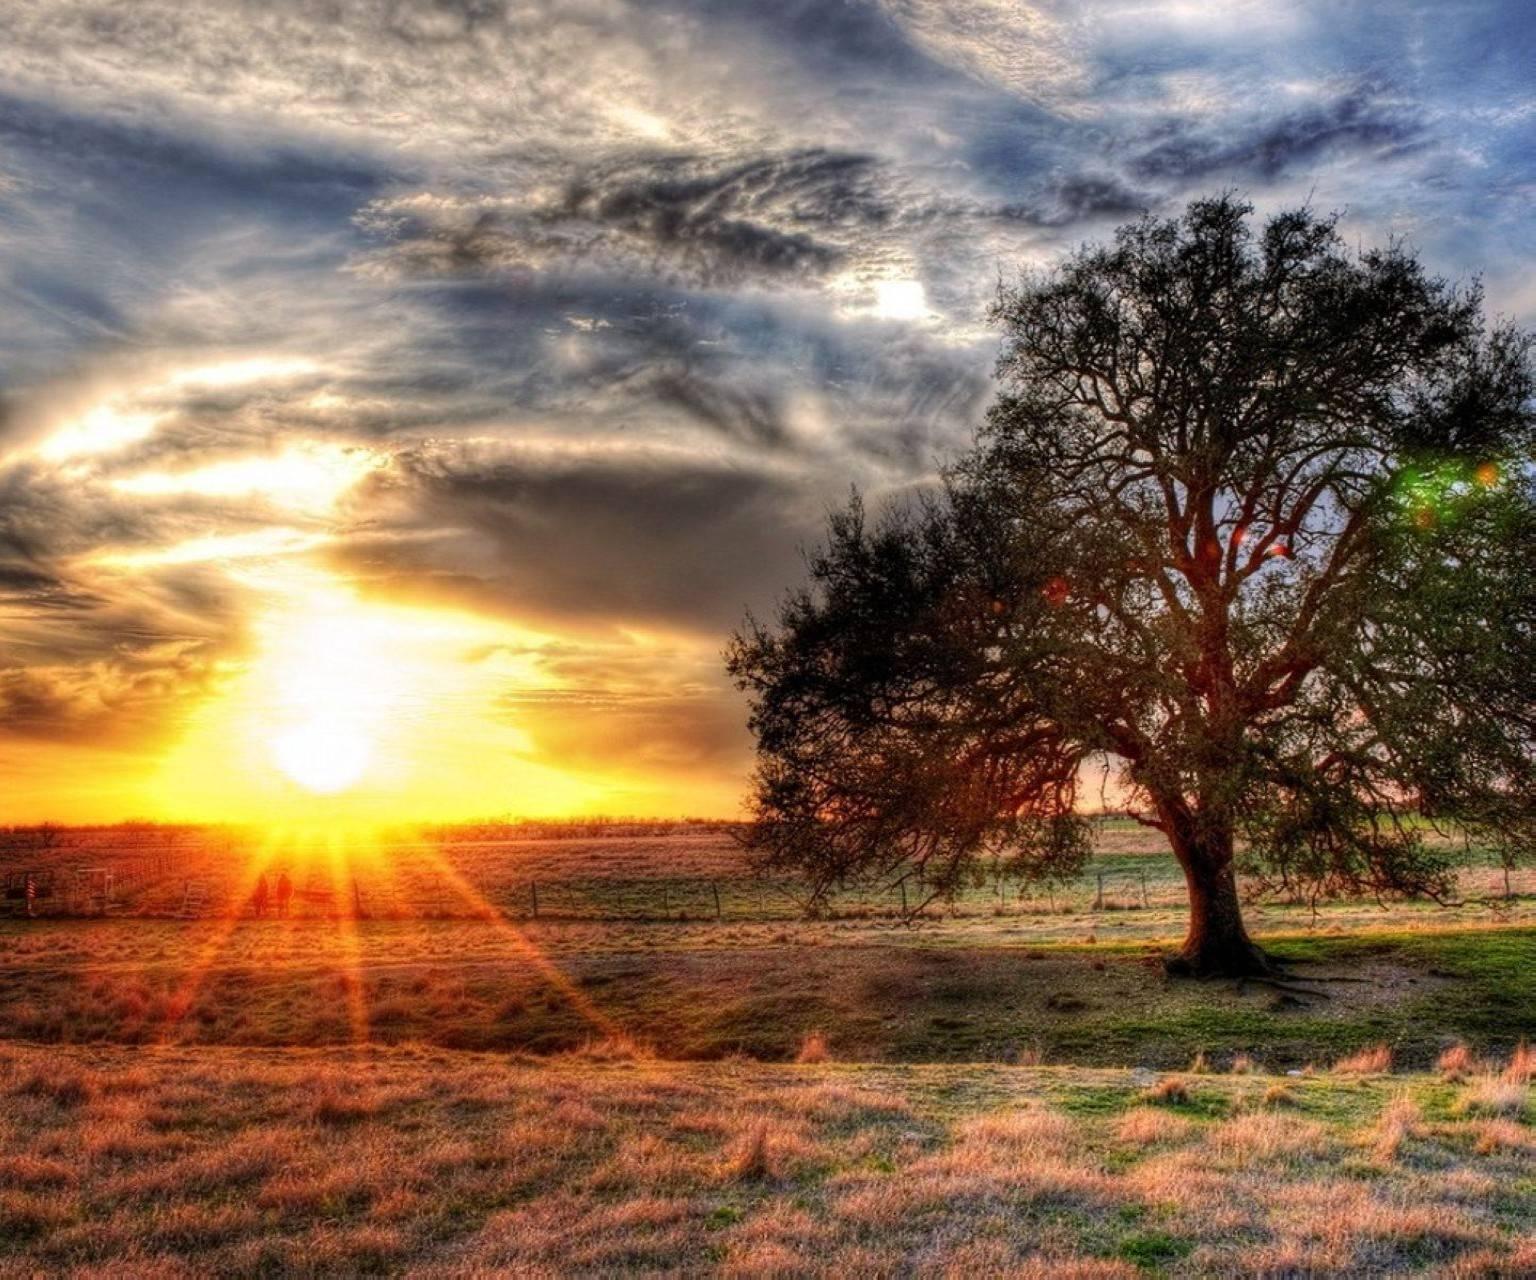 Sunsit Tree